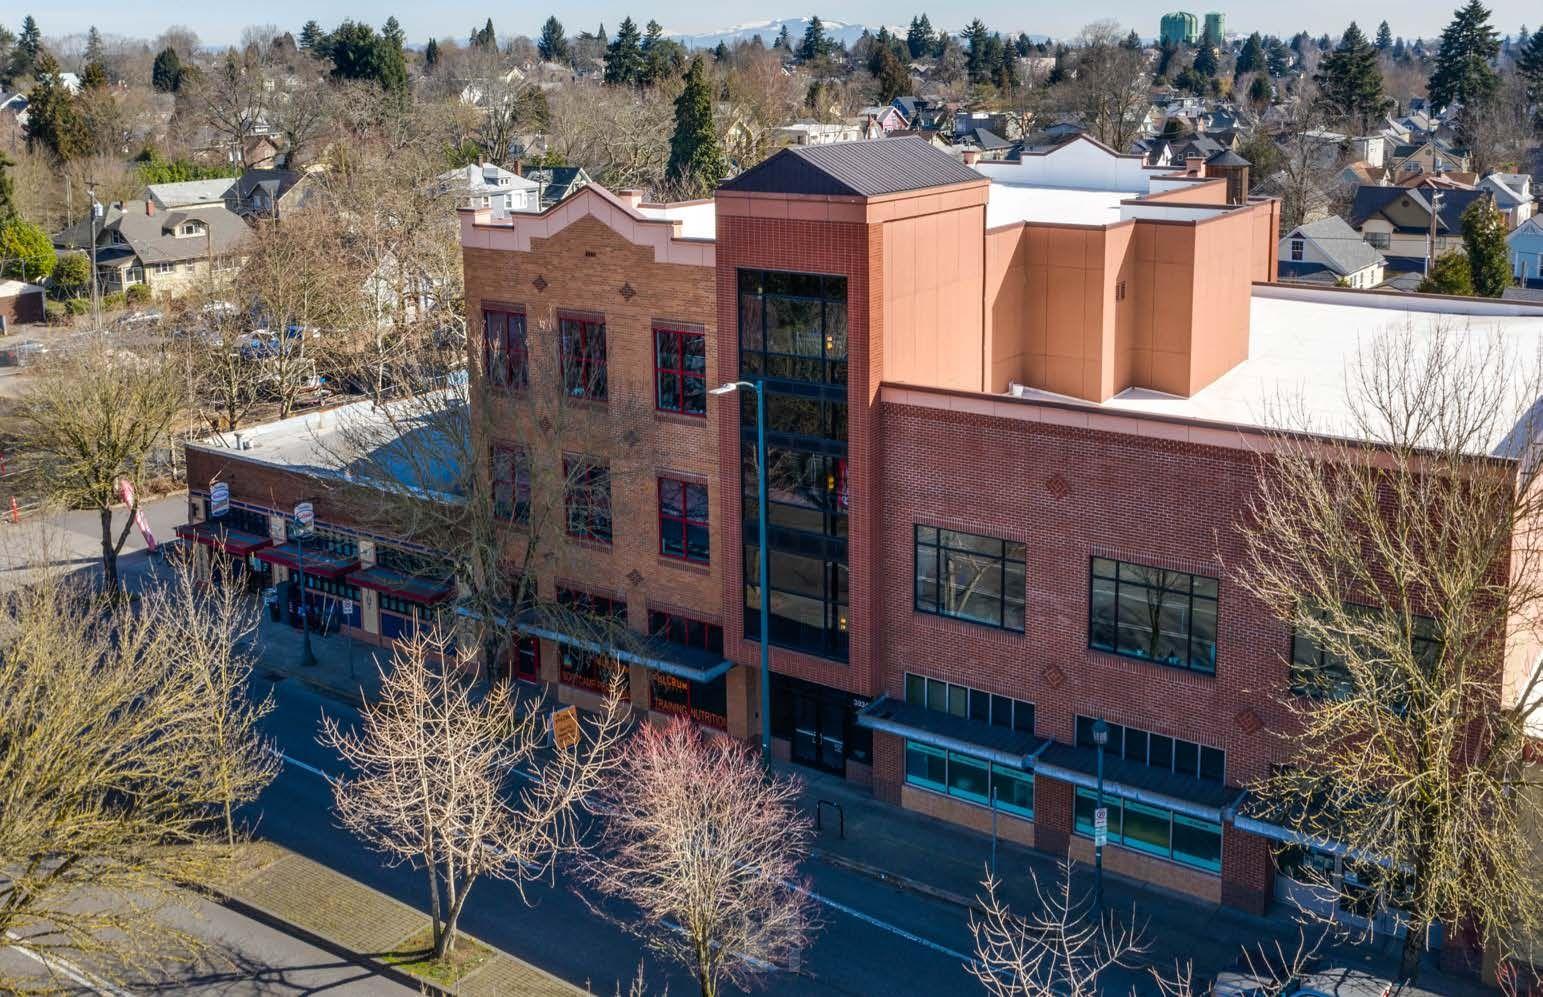 Oregon州Portland多租户写字楼, 100%出租率,5.14%回报率